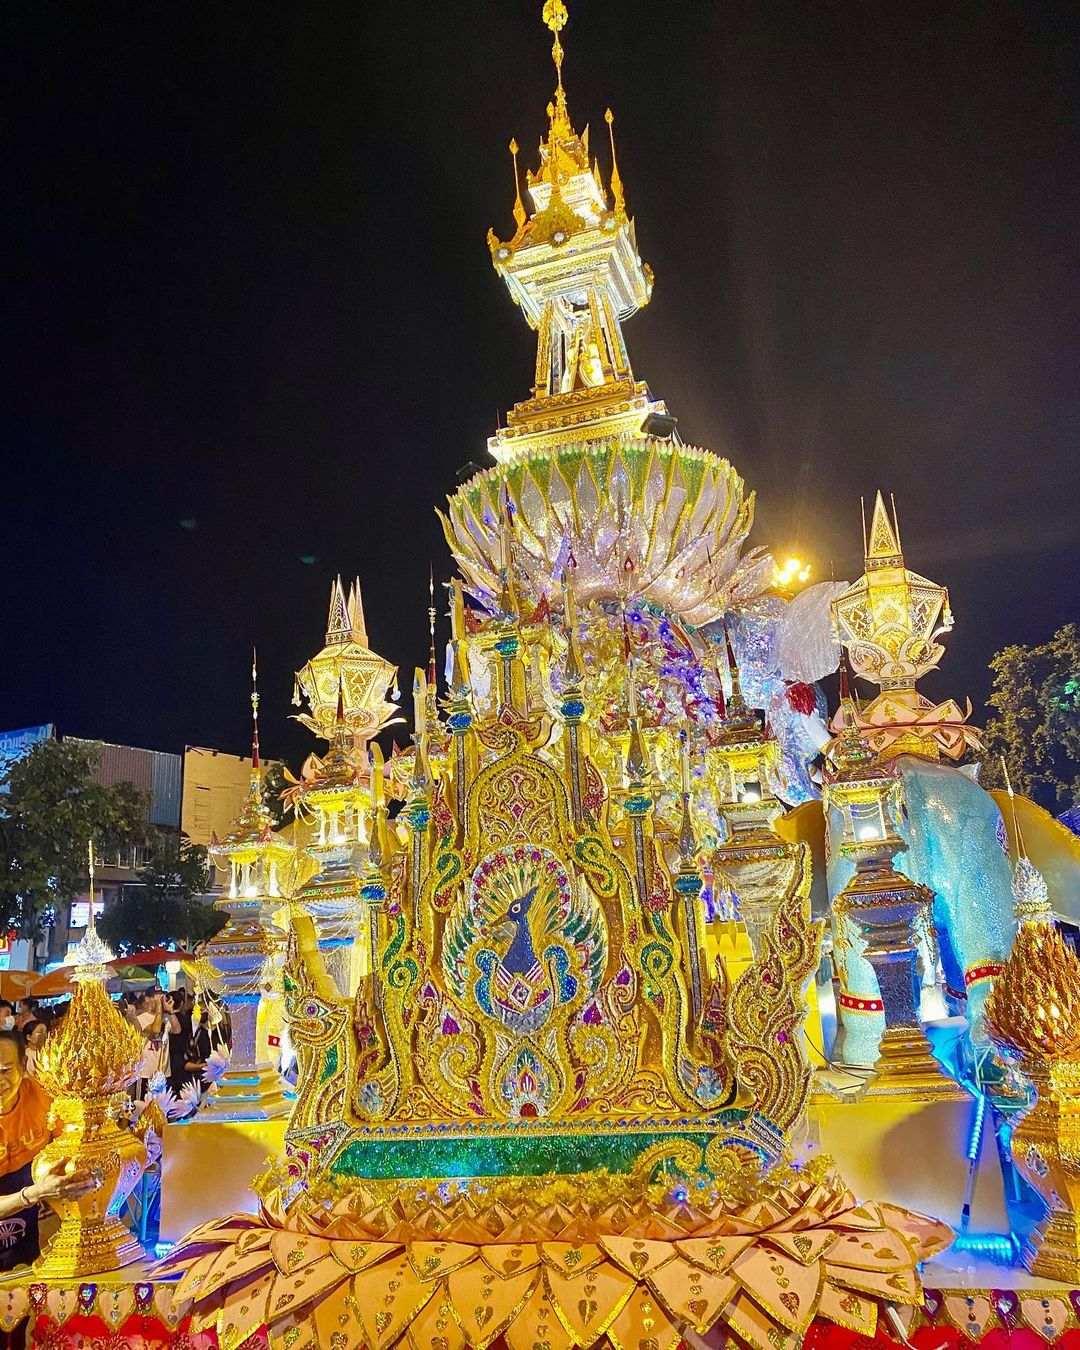 Yee Peng Festival 2020 in Chiang Mai, Thailand